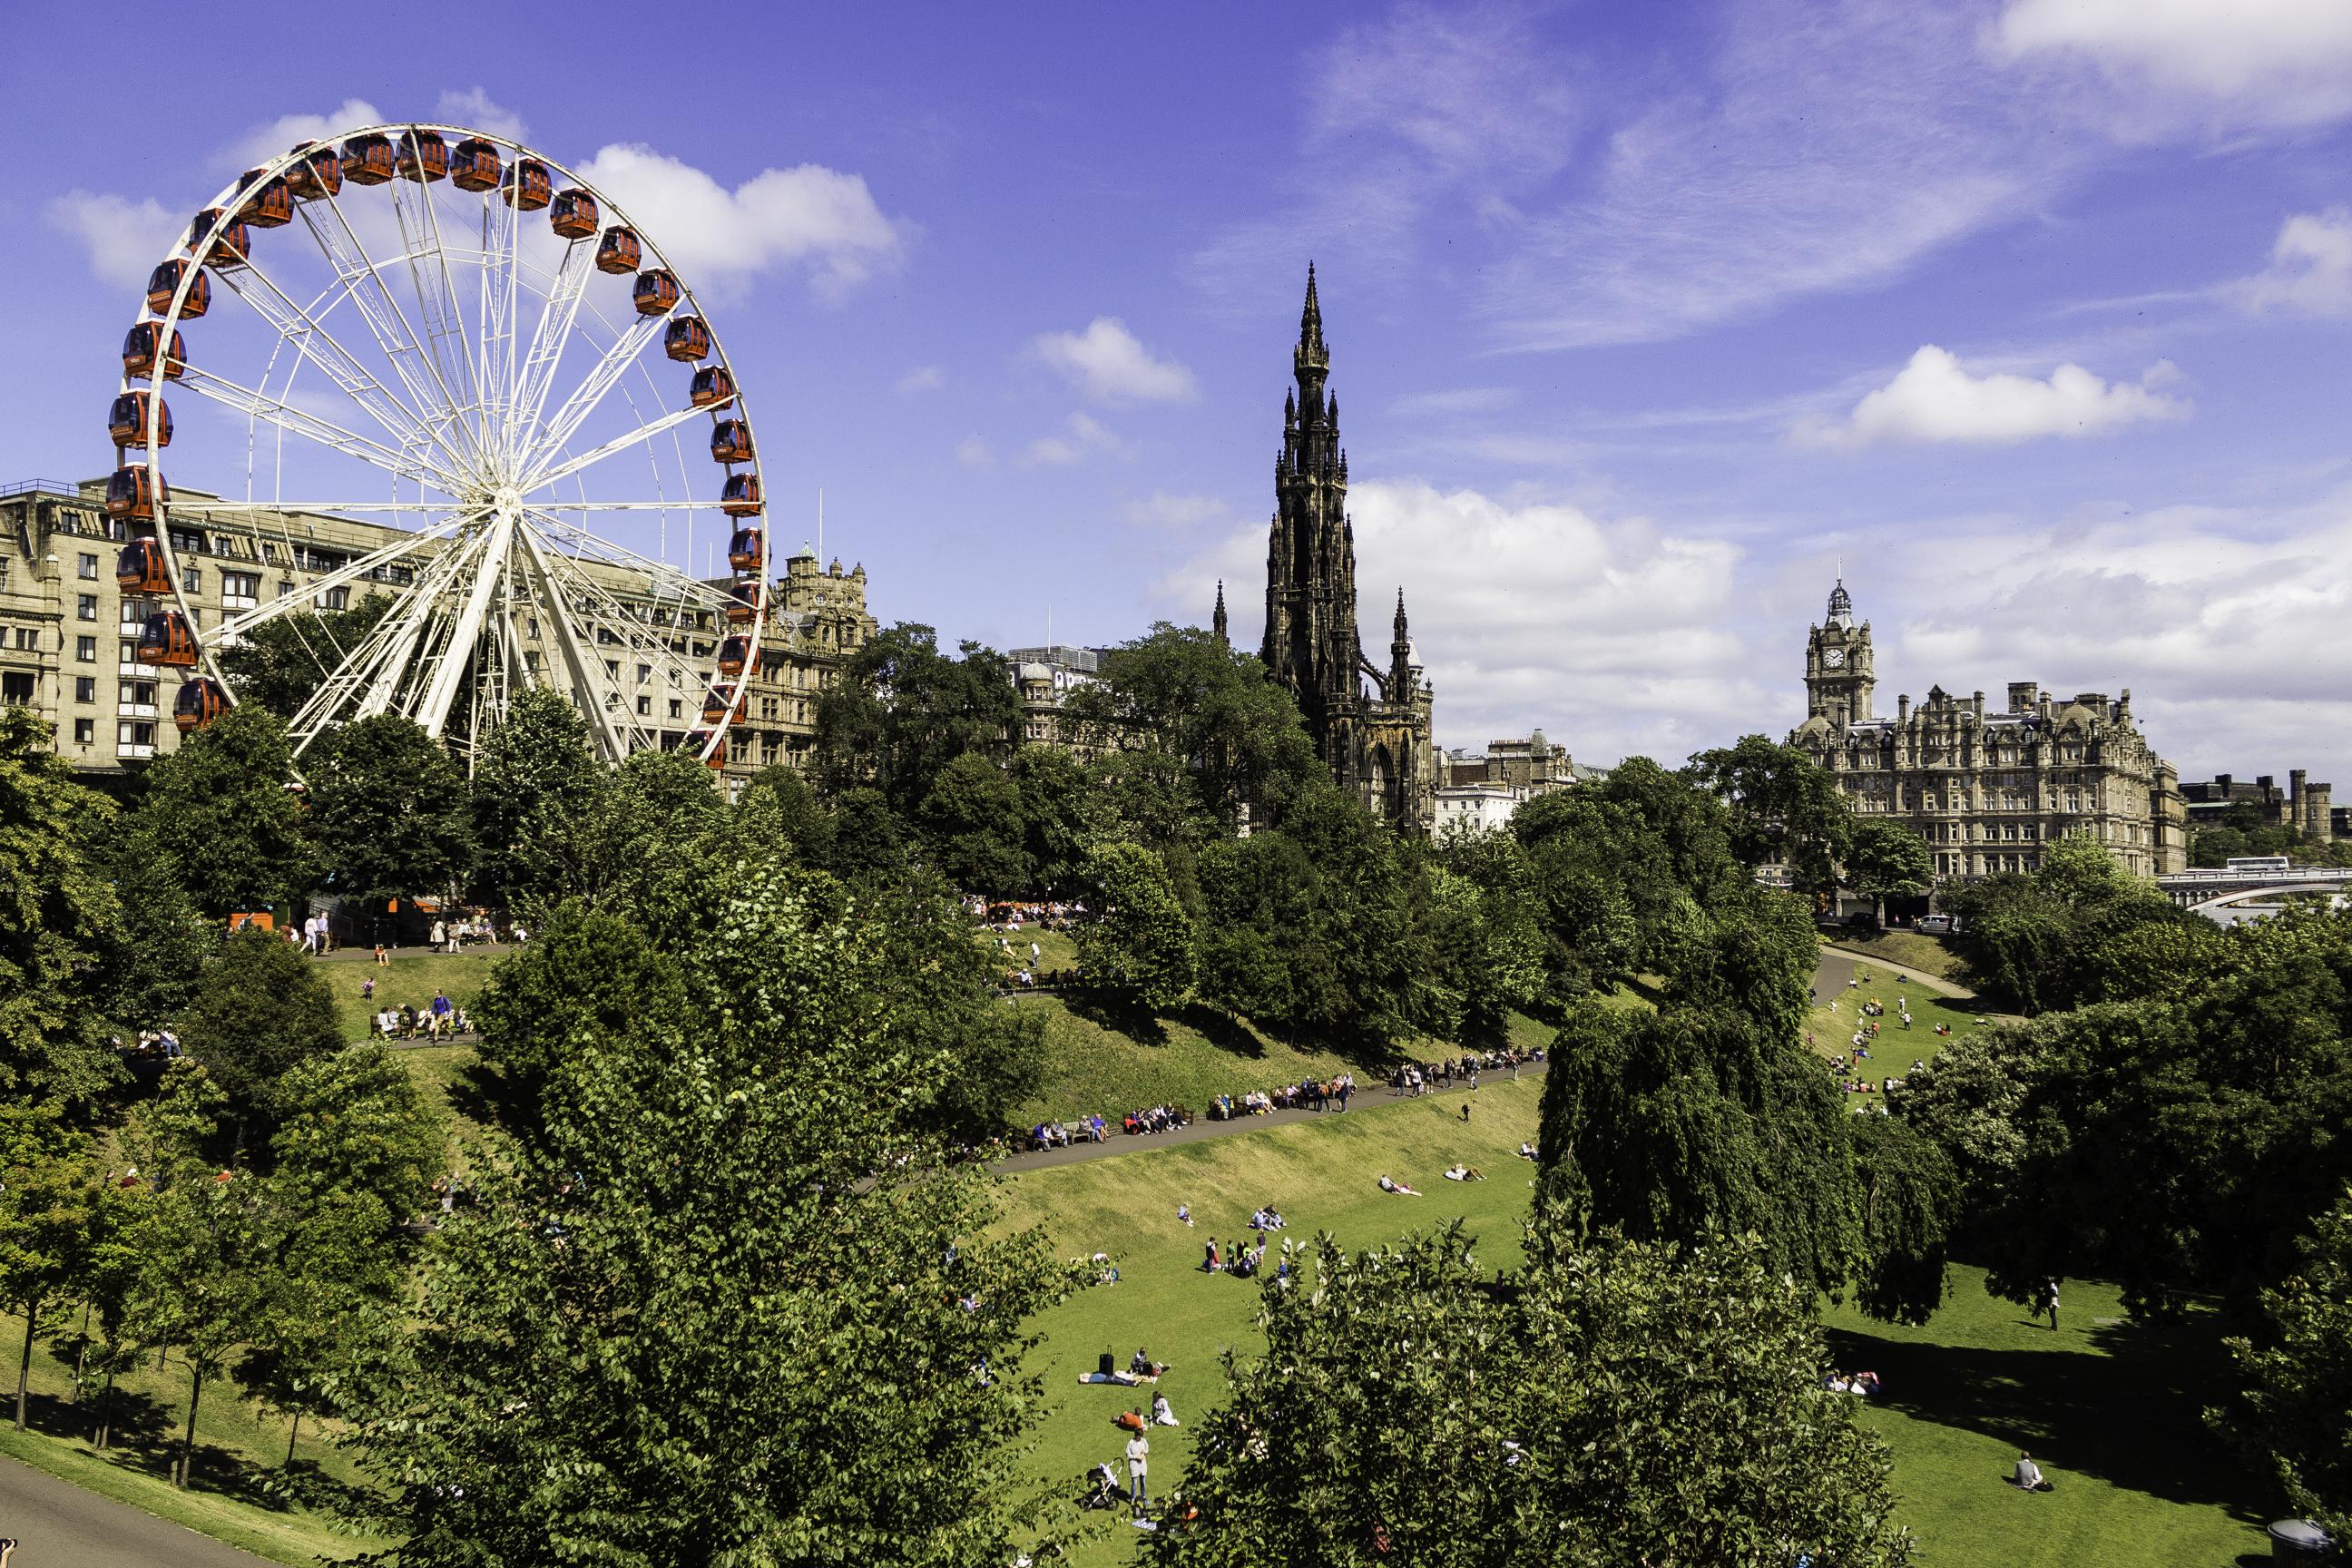 Edinburgh in July